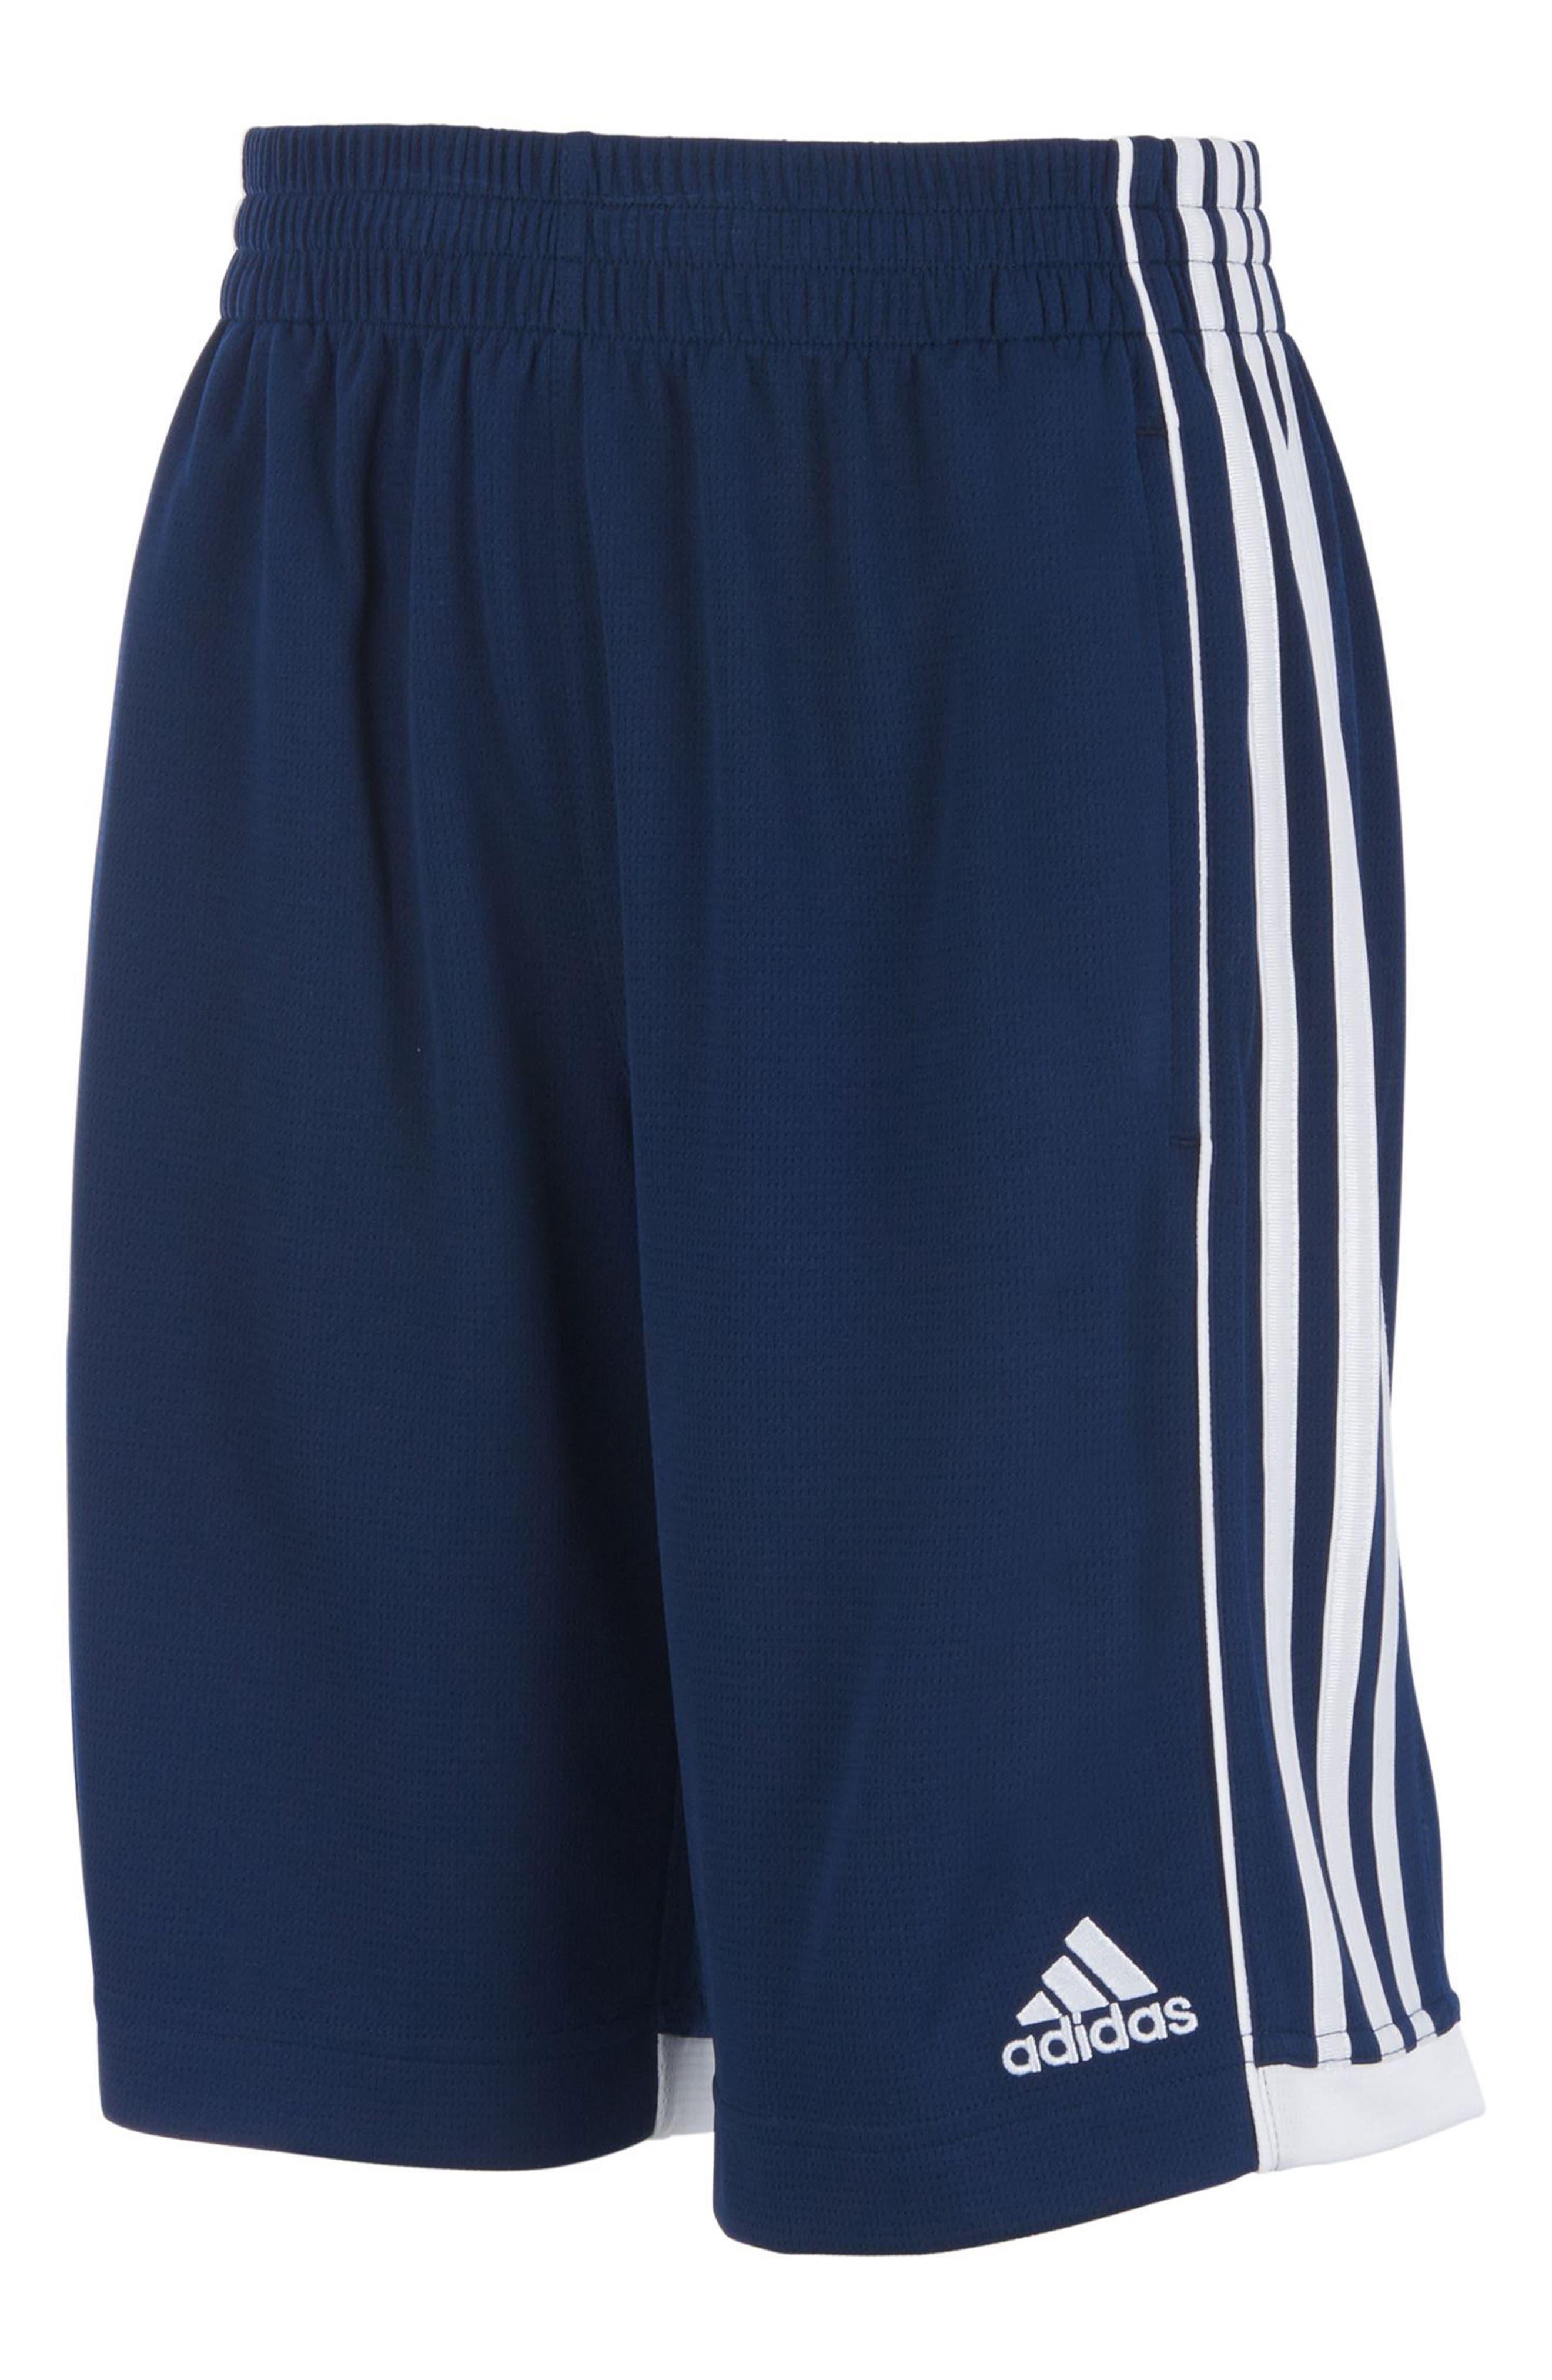 Replenishment Speed Shorts,                         Main,                         color, Navy